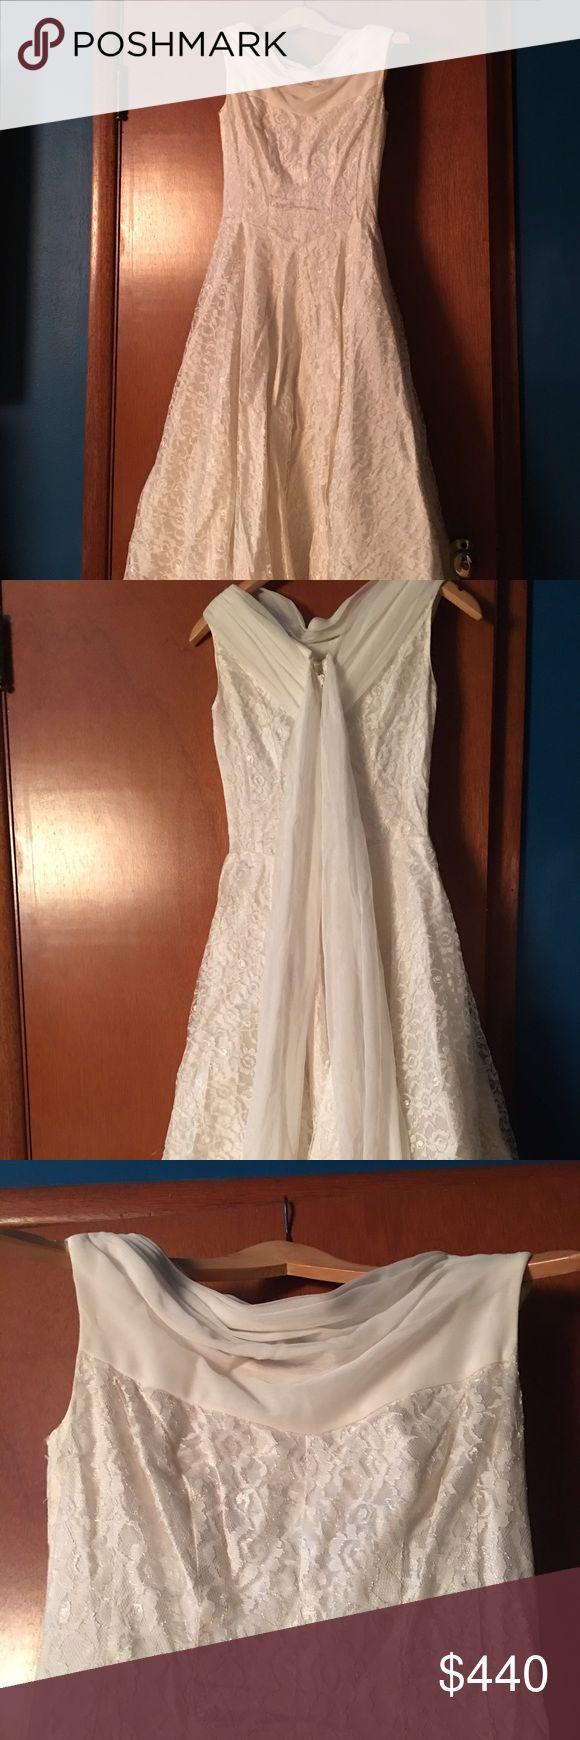 Vntg Tea Length Off White Lace Dress XS/S/petite Vintage Sleeveless Off White Lace Wedding Dress. Metal Zipper. Gorgeous chiffon drape in the back. Slight chiffon drape neck.  13 in across bust. 12 in across waist. 43 in shoulder to bottom of hem. Dresses Wedding